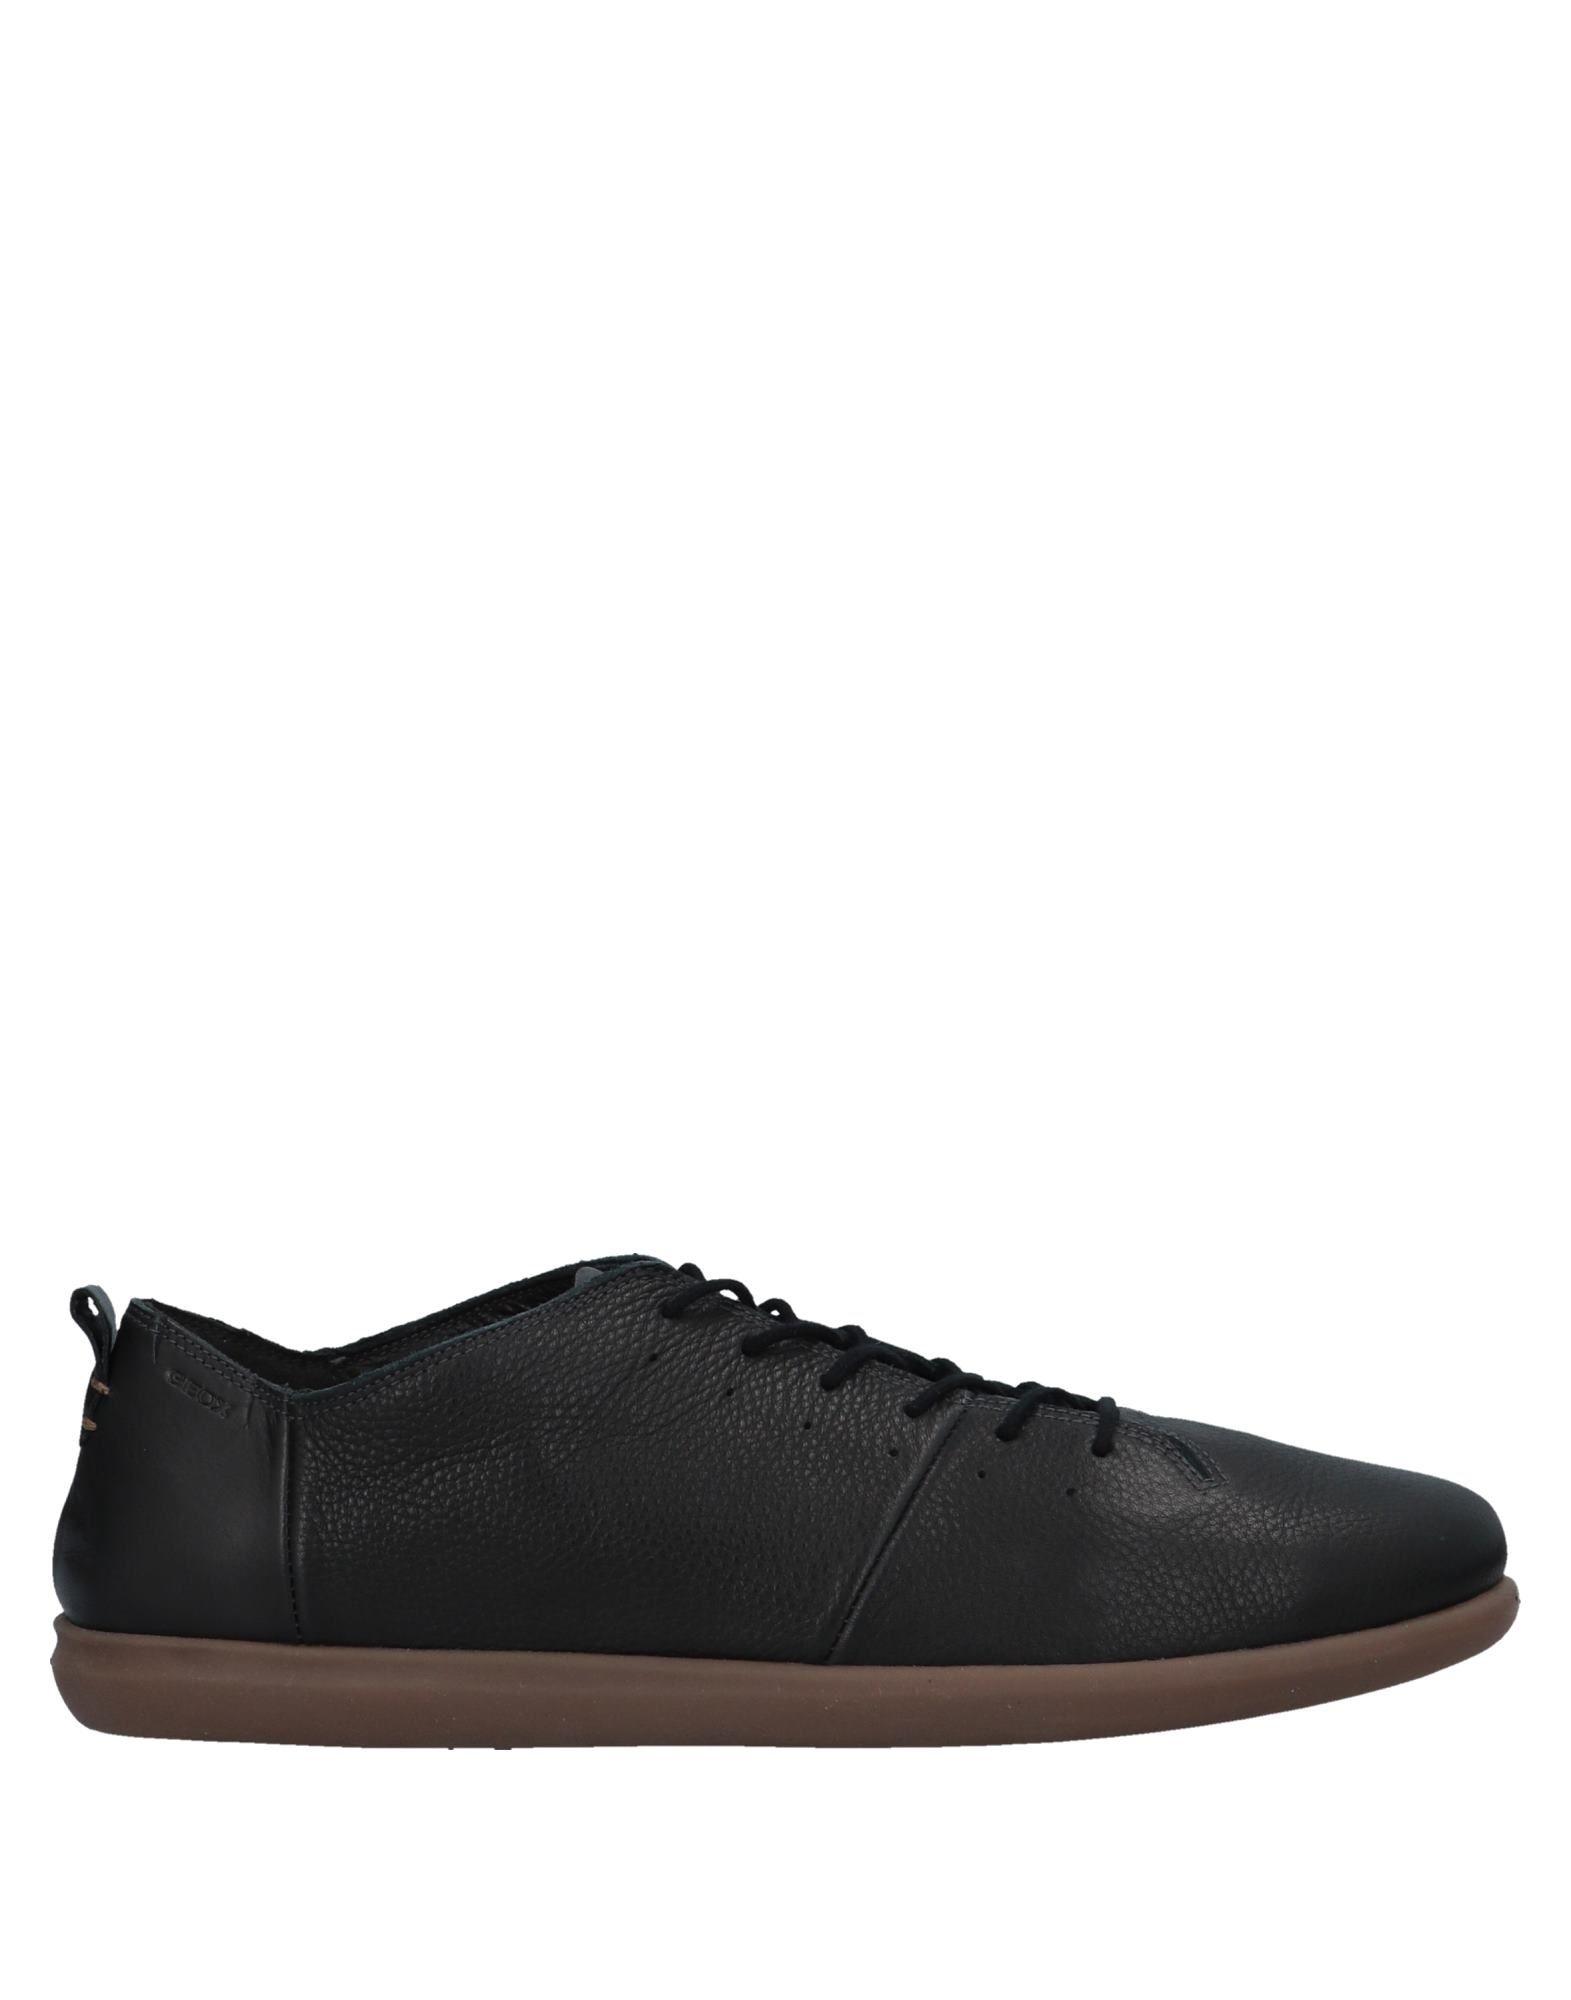 Moda Sneakers Geox Uomo - 11192233FV